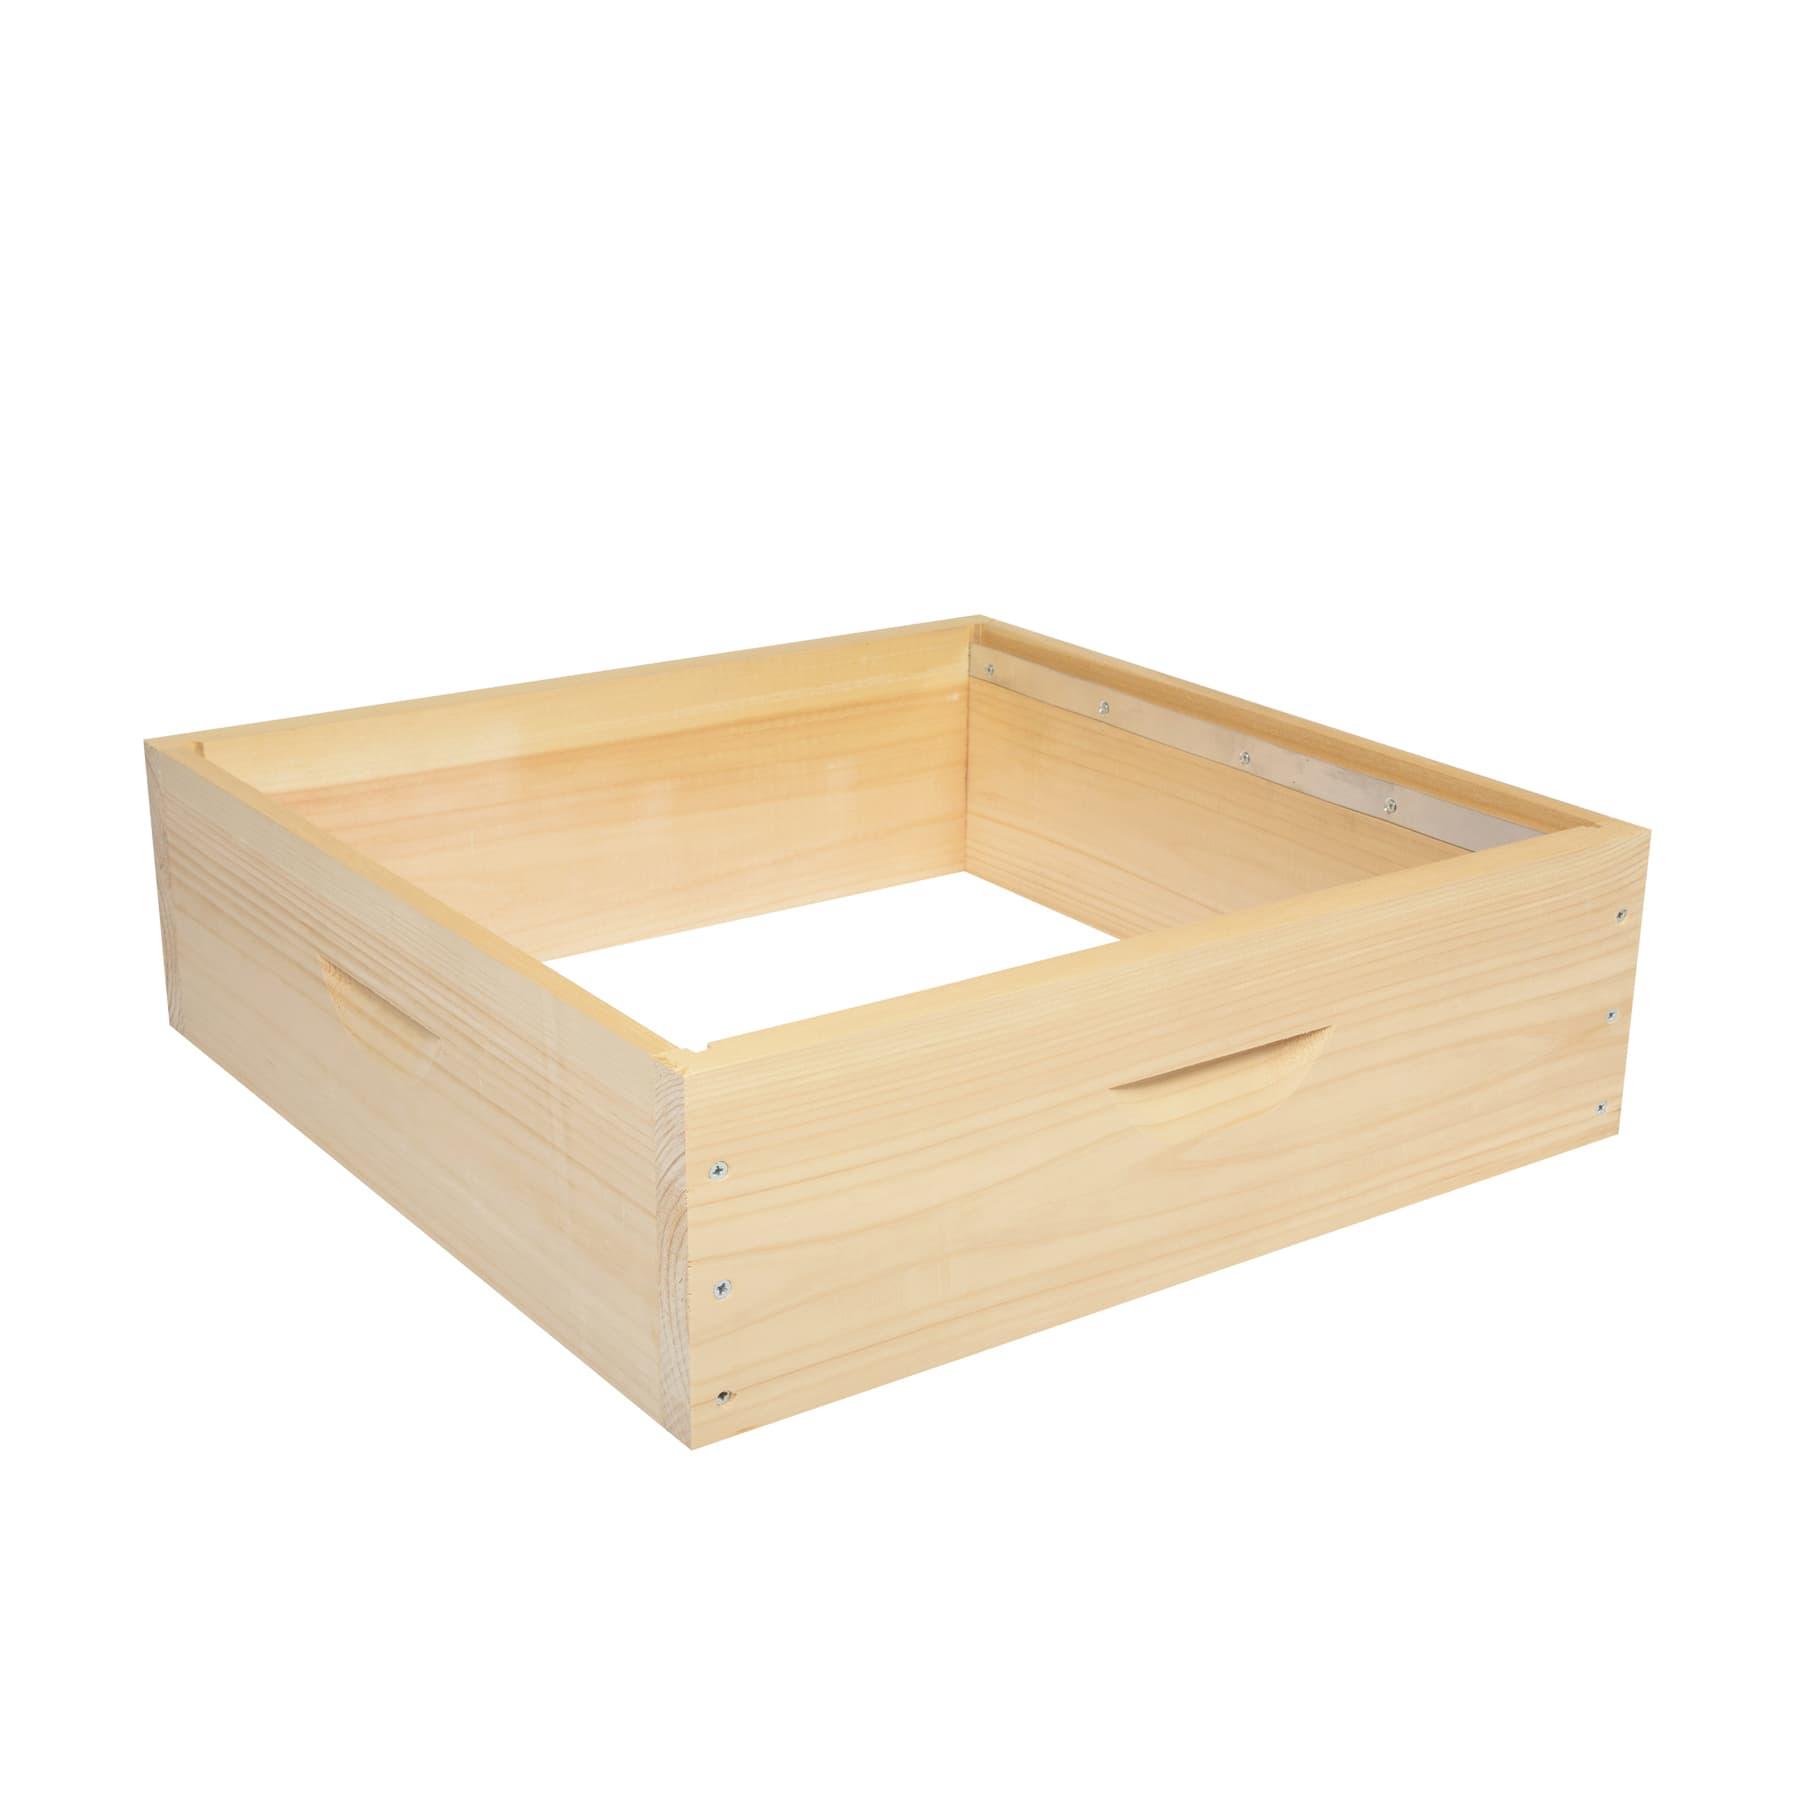 Dadant mod.  Honigraumzarge Holz 150 mm hoch